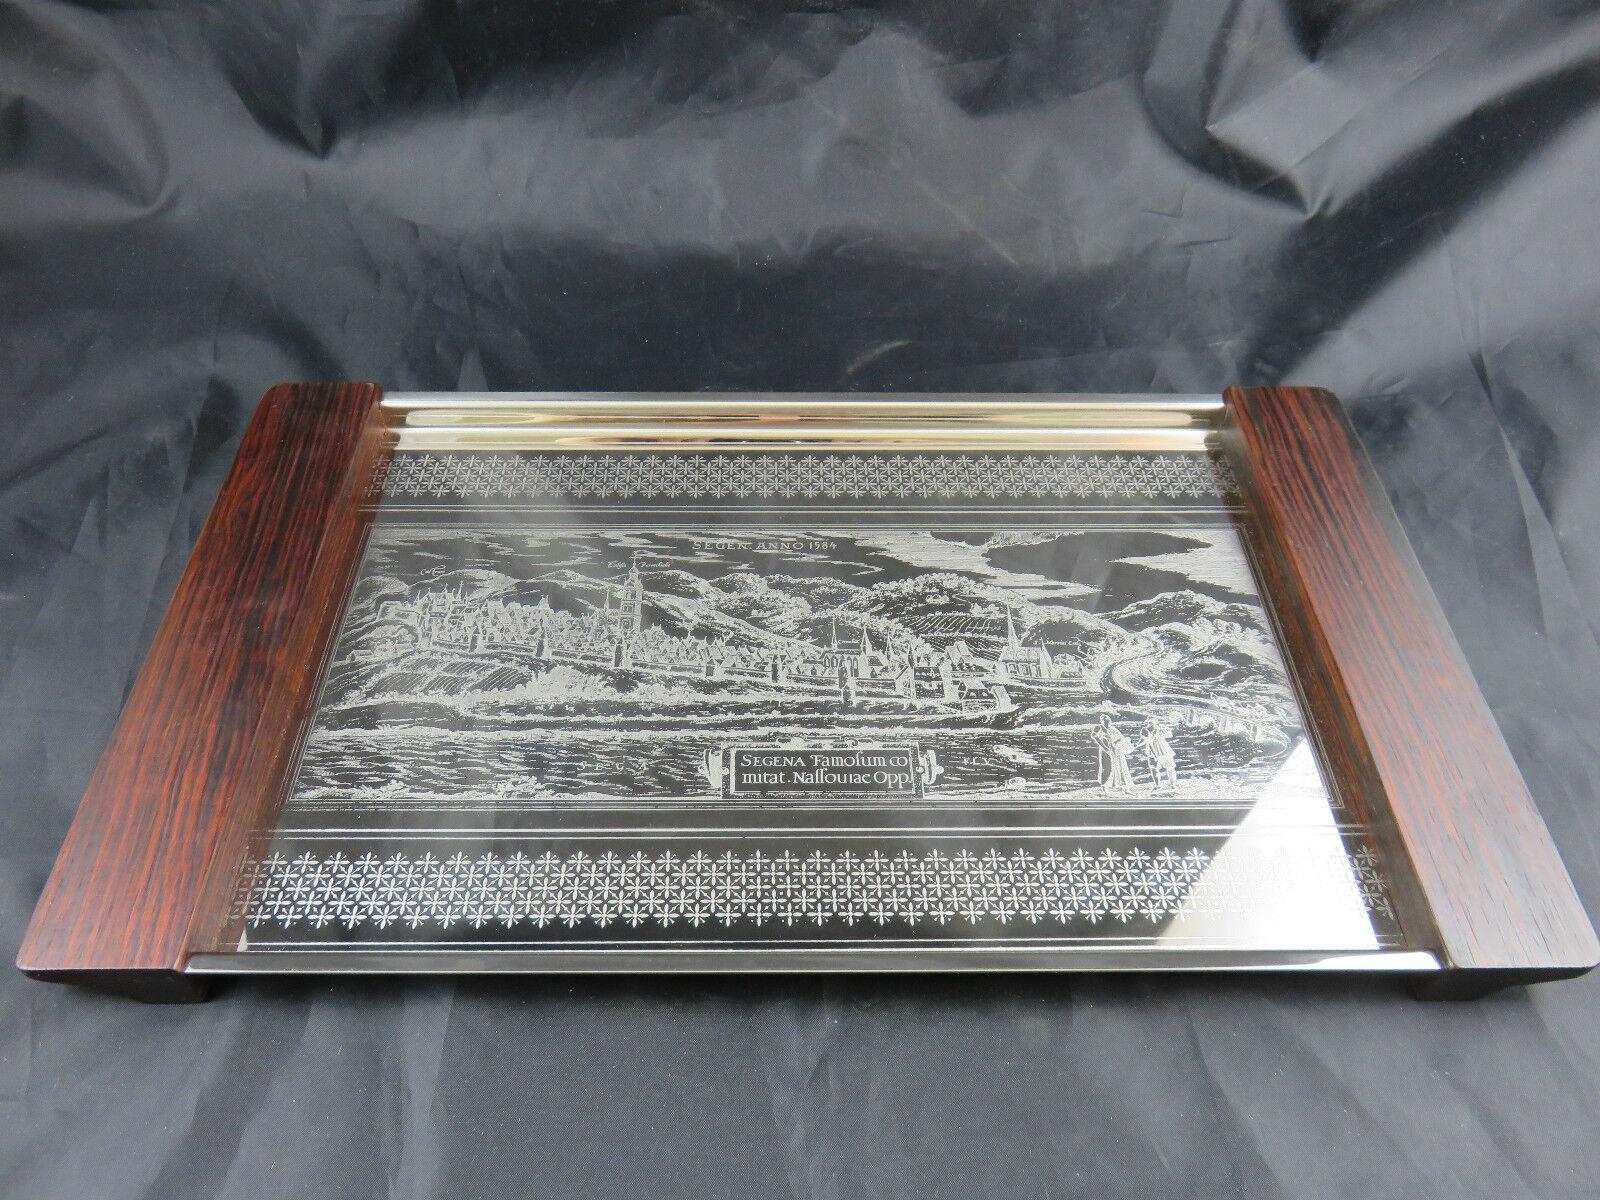 serviertablett holz griffe edelstahl boden mit bild segena famofum co anno 1584 chf. Black Bedroom Furniture Sets. Home Design Ideas